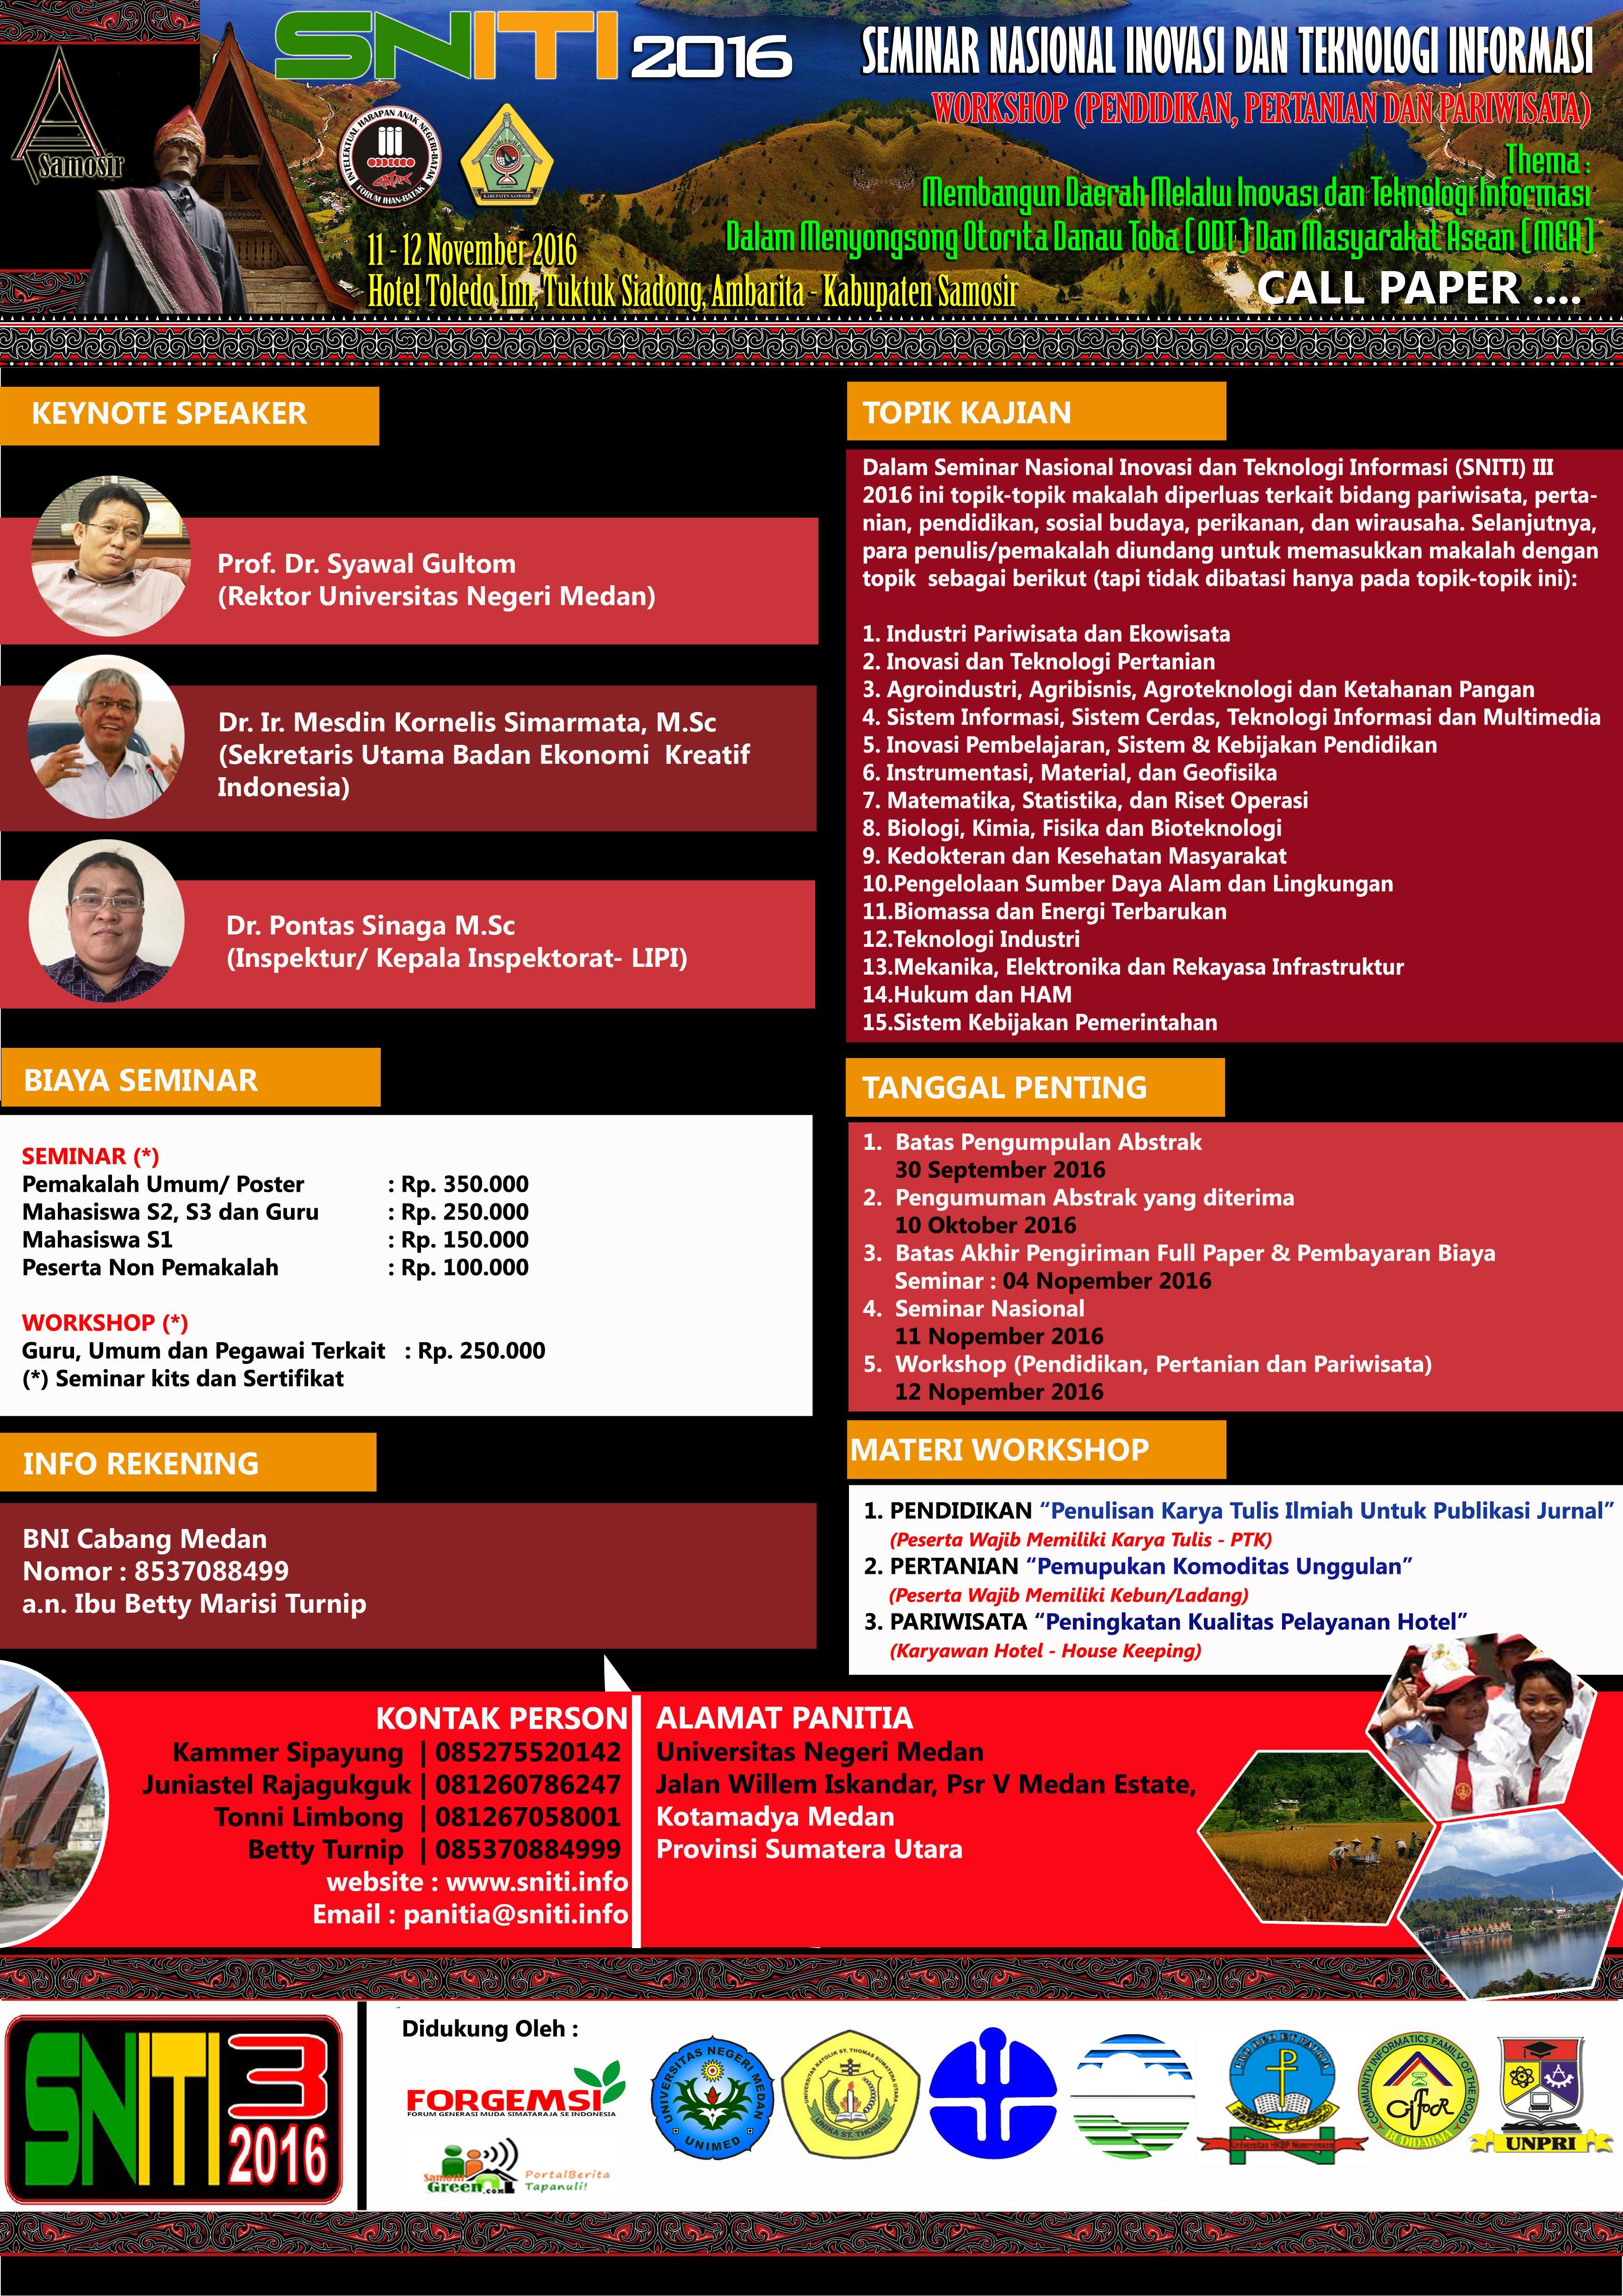 Poster Seminar Nasional Sniti Contoh Poster Pinterest